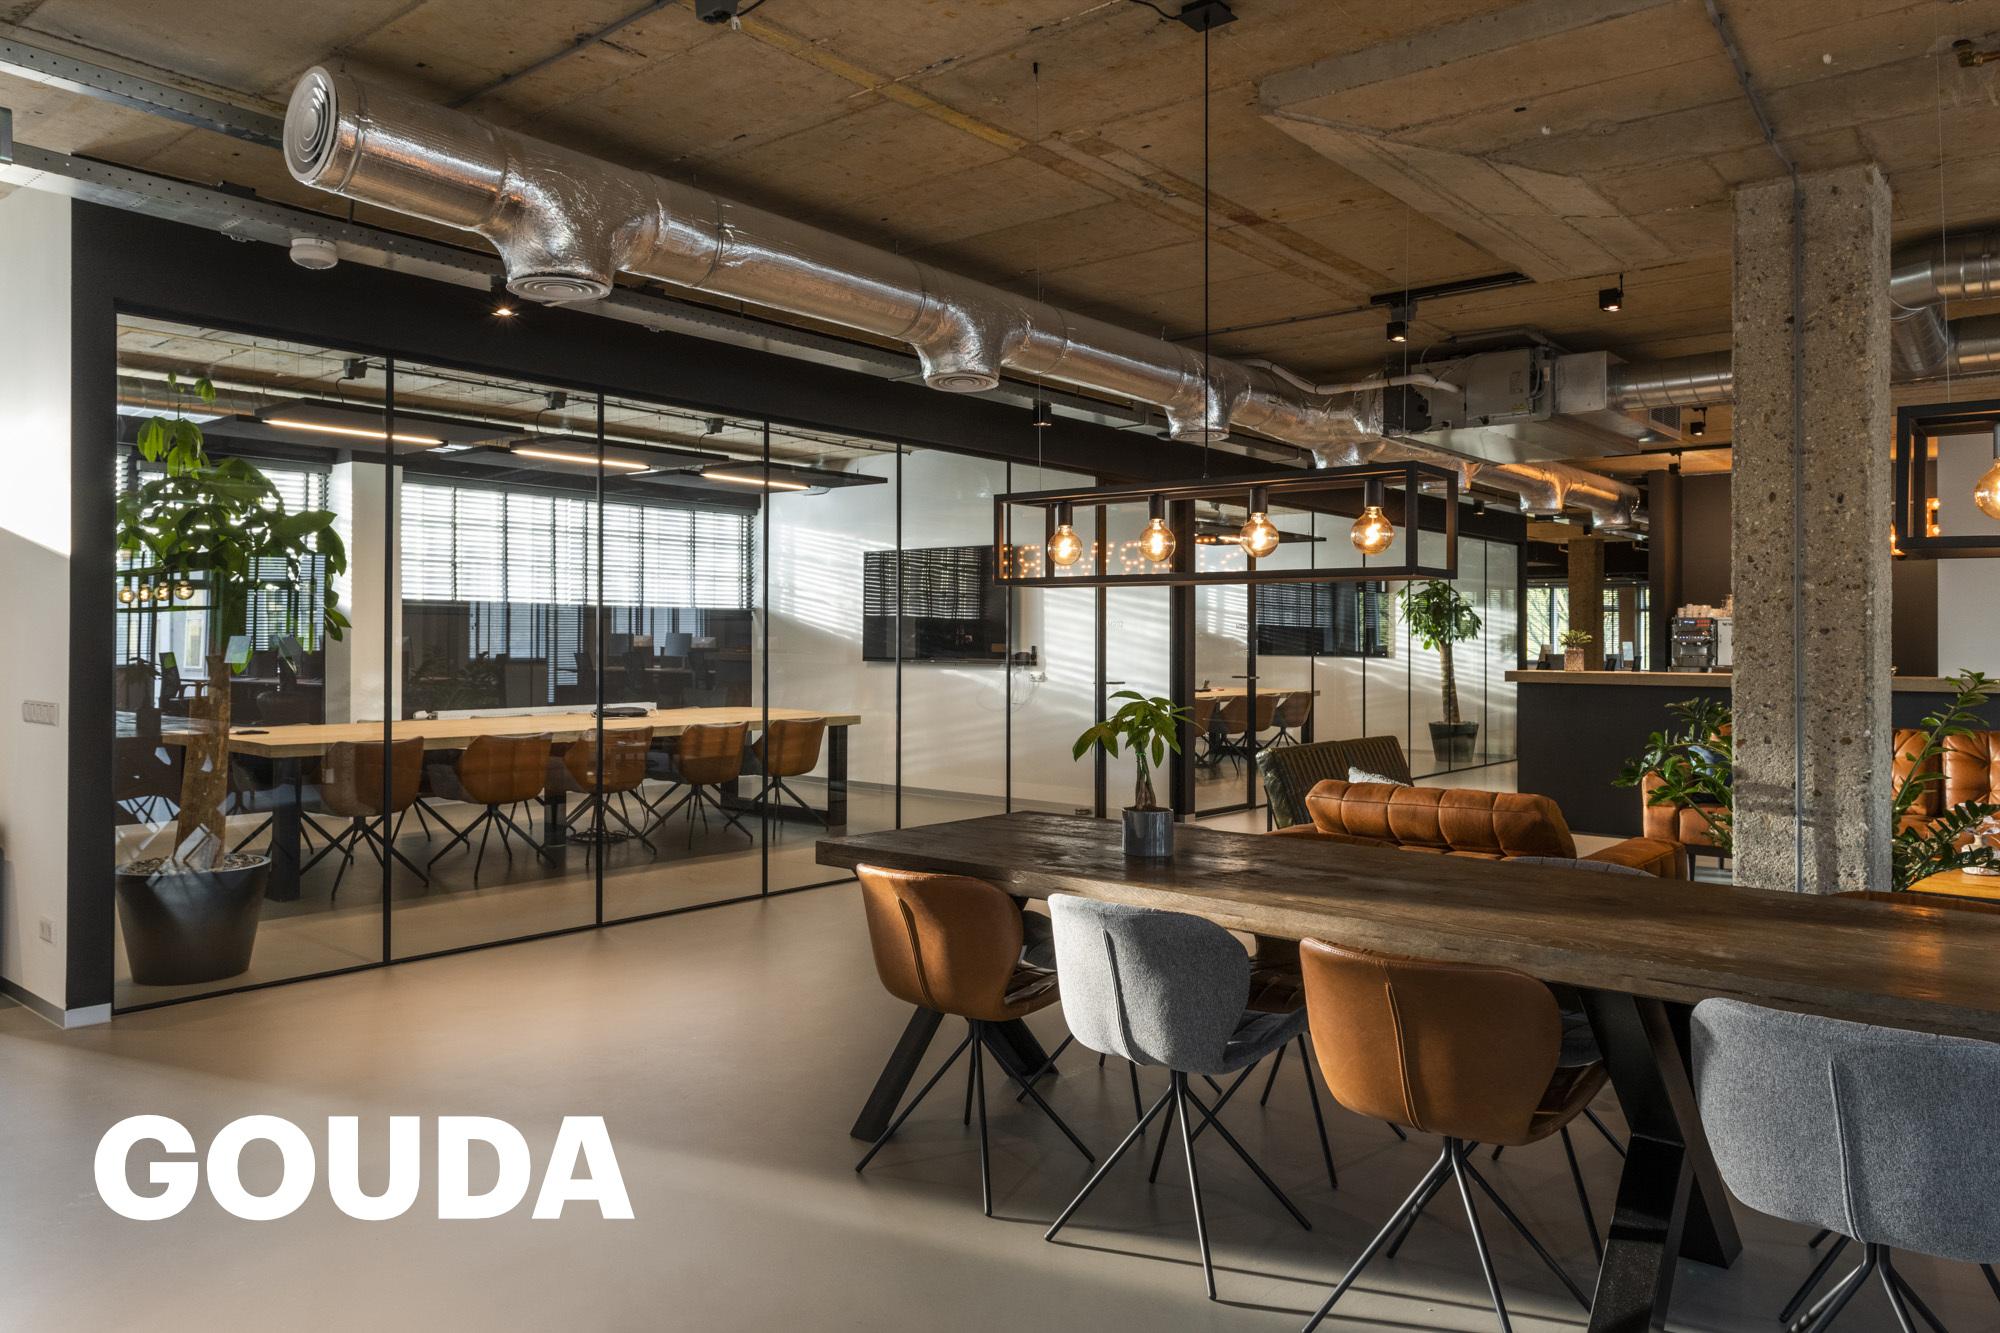 Main Office Gouda - Contact us